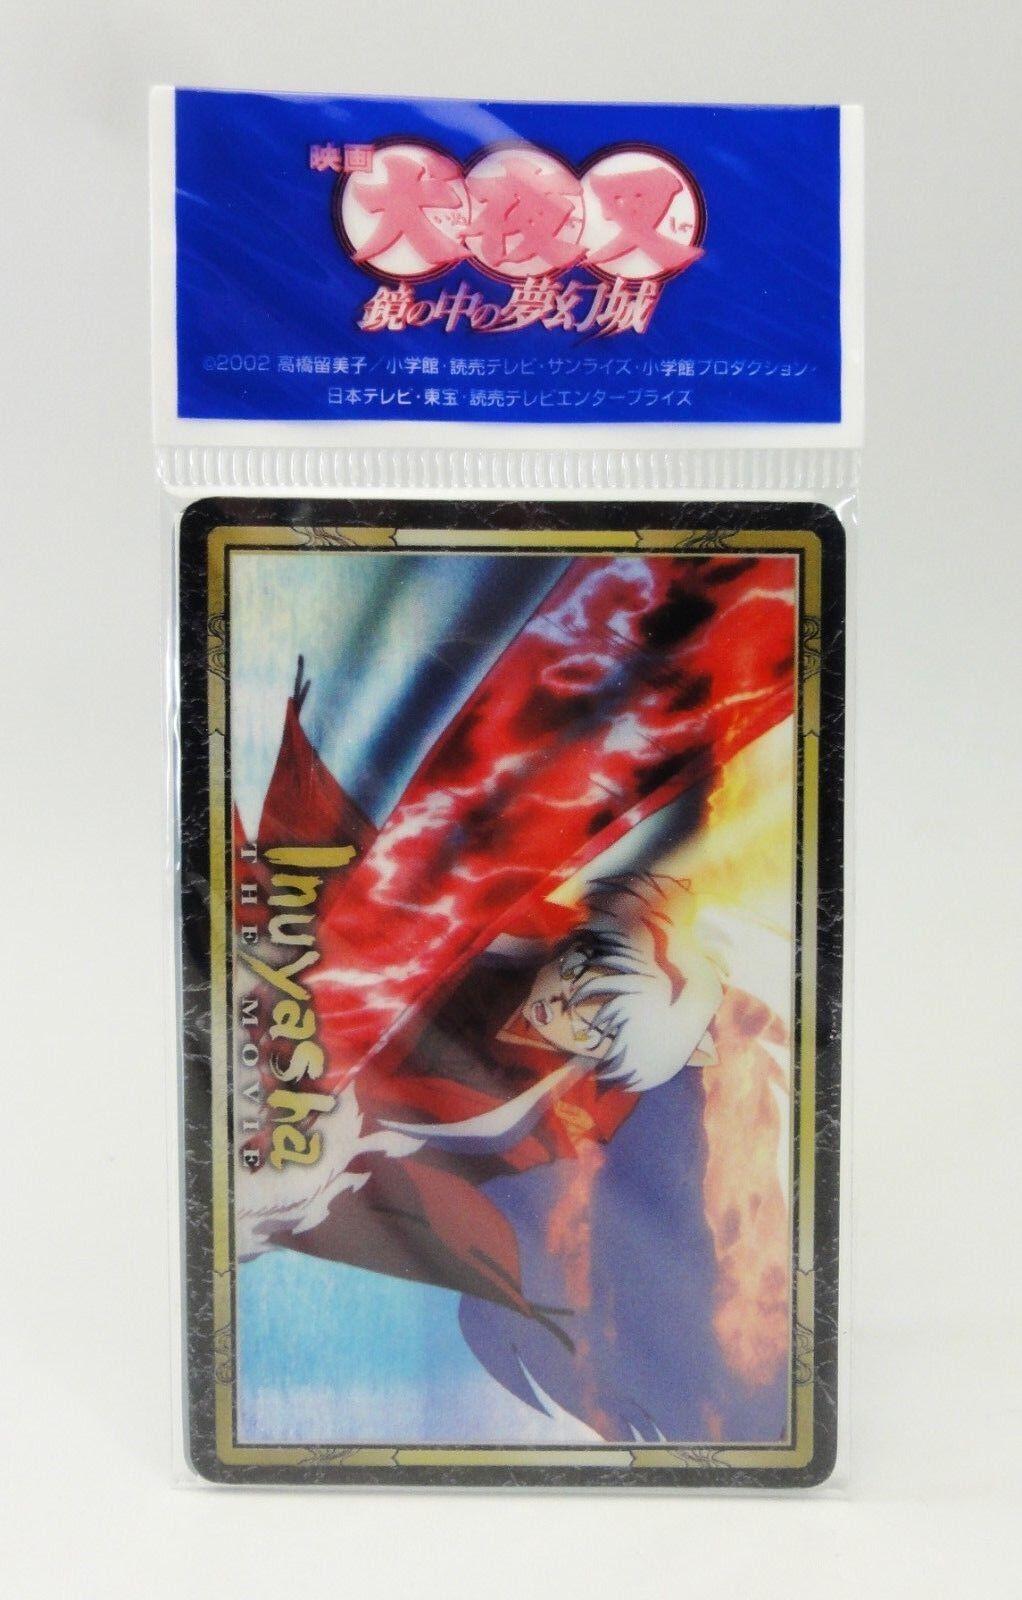 INUYASHA The Movie Clear Card C Set MOVIC JAPAN